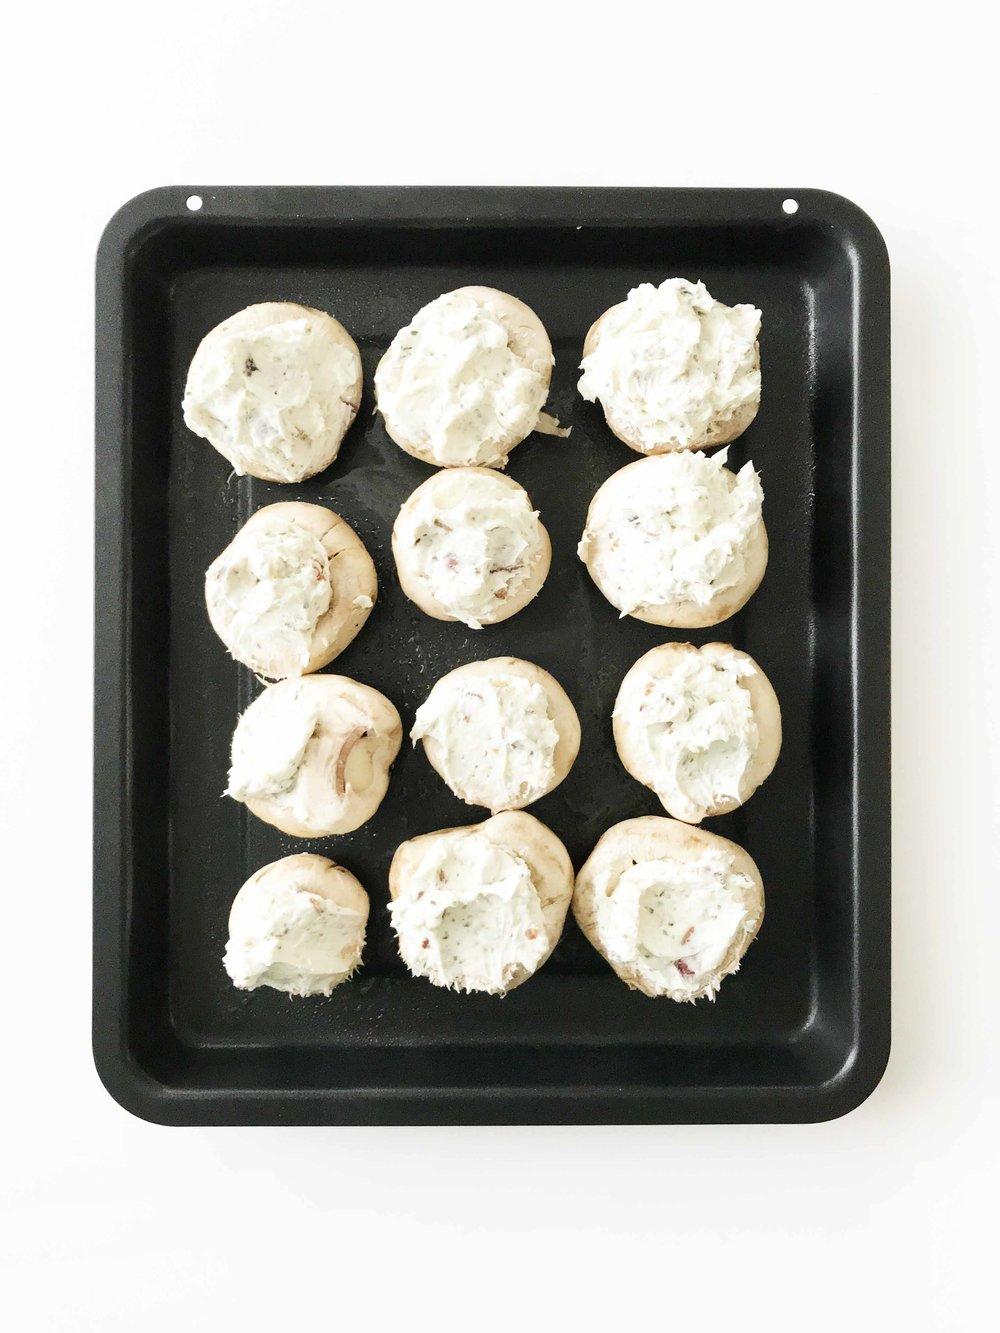 stuffed-mushrooms2.jpg